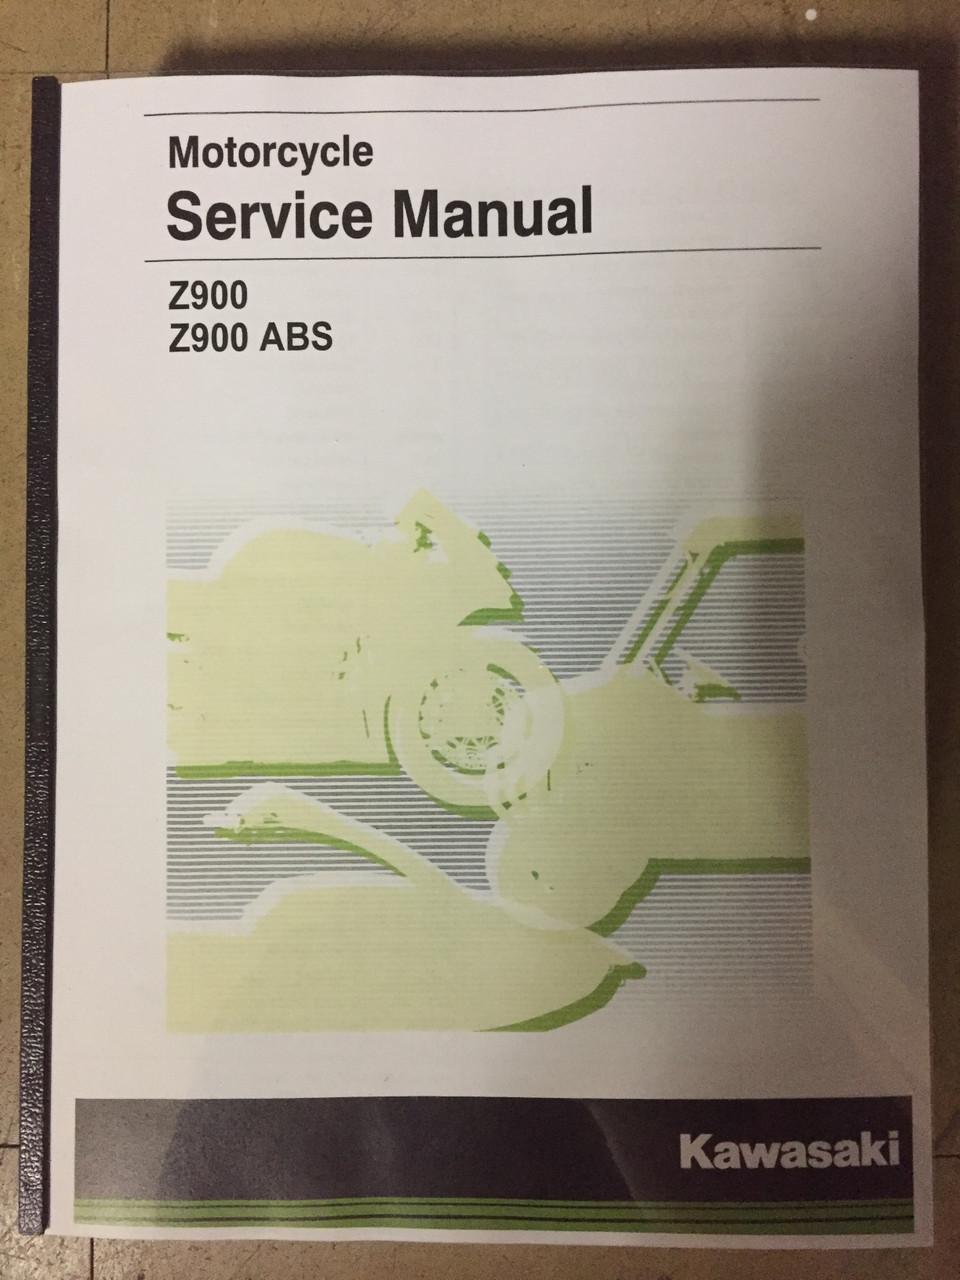 2017-2019 Kawasaki Z900 / ABS Part# 99924-1525-04 service shop repair manual